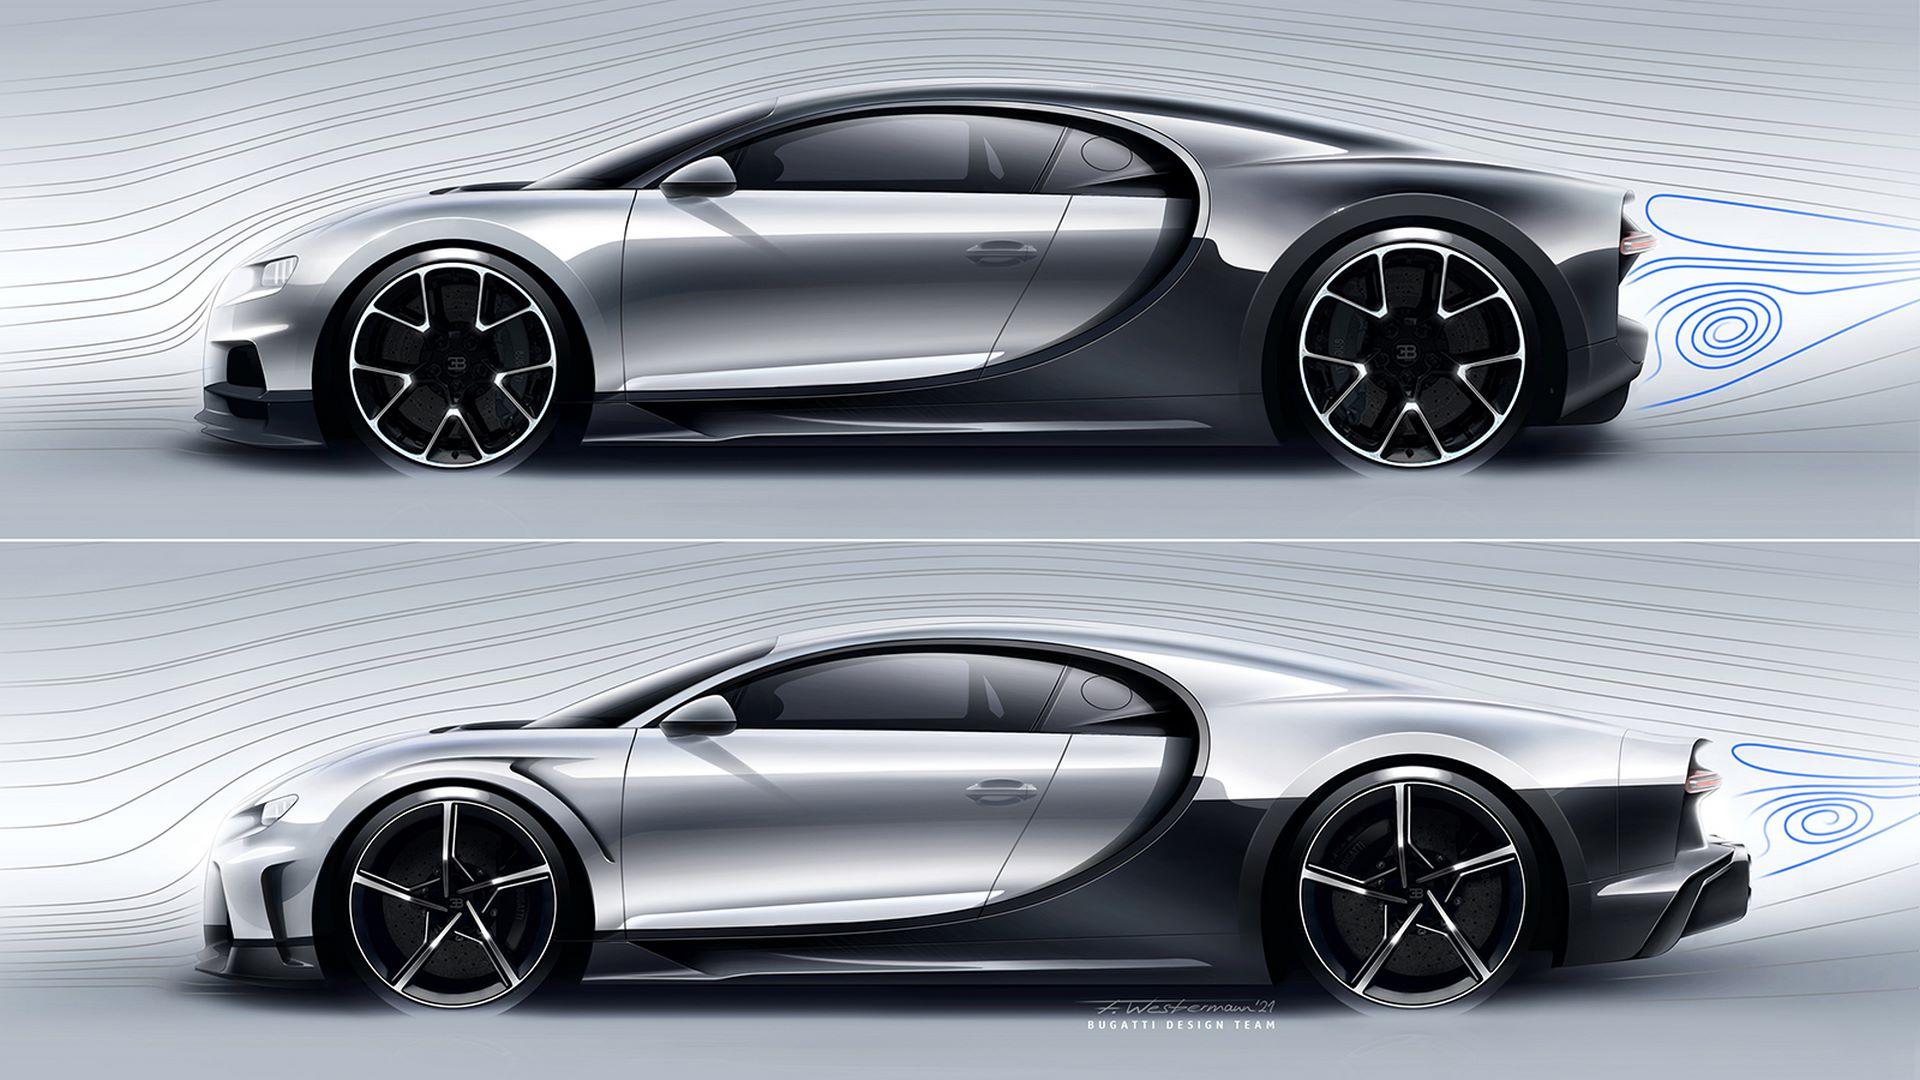 05-04_bugatti_chiron_super_sport_design_sketch_tear_off